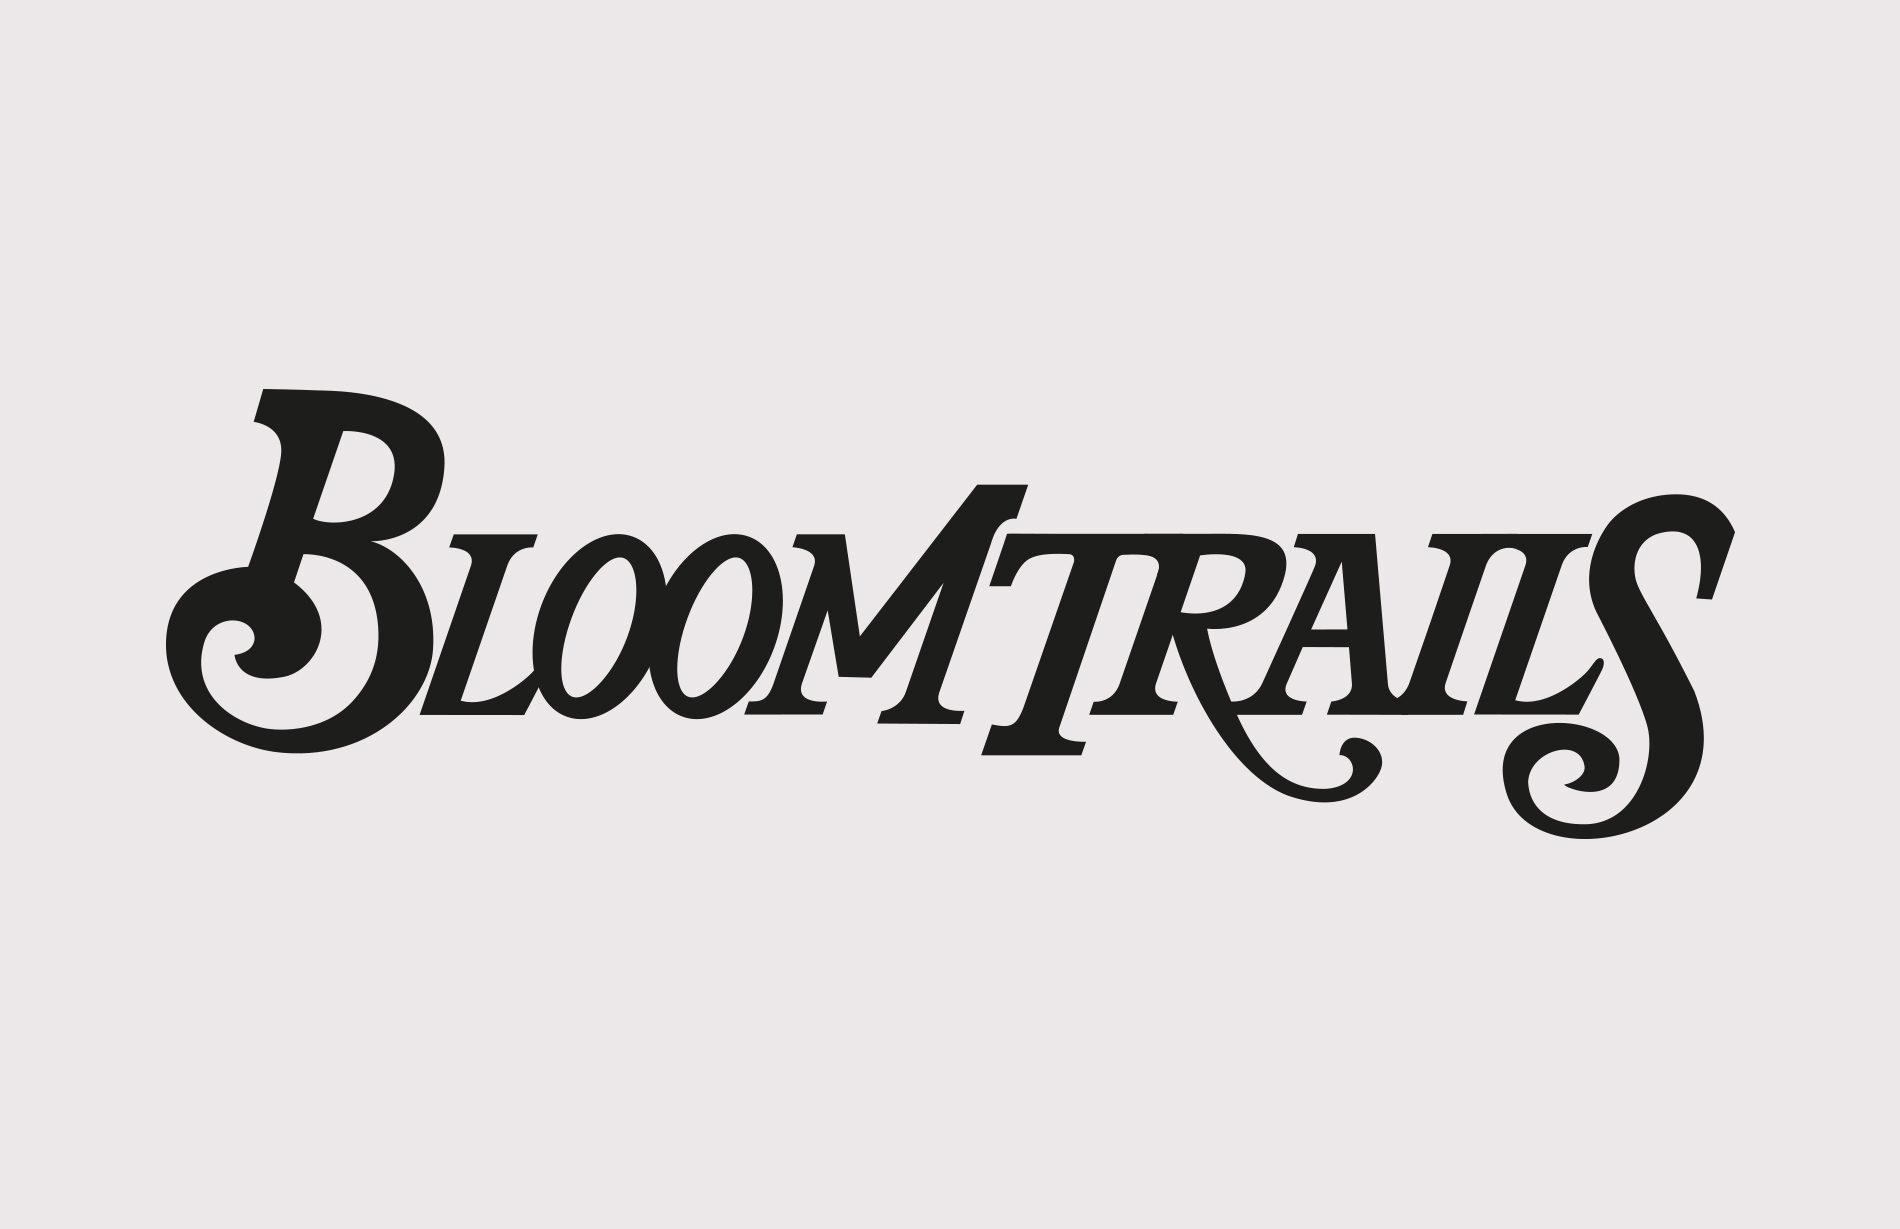 bloomTrails2